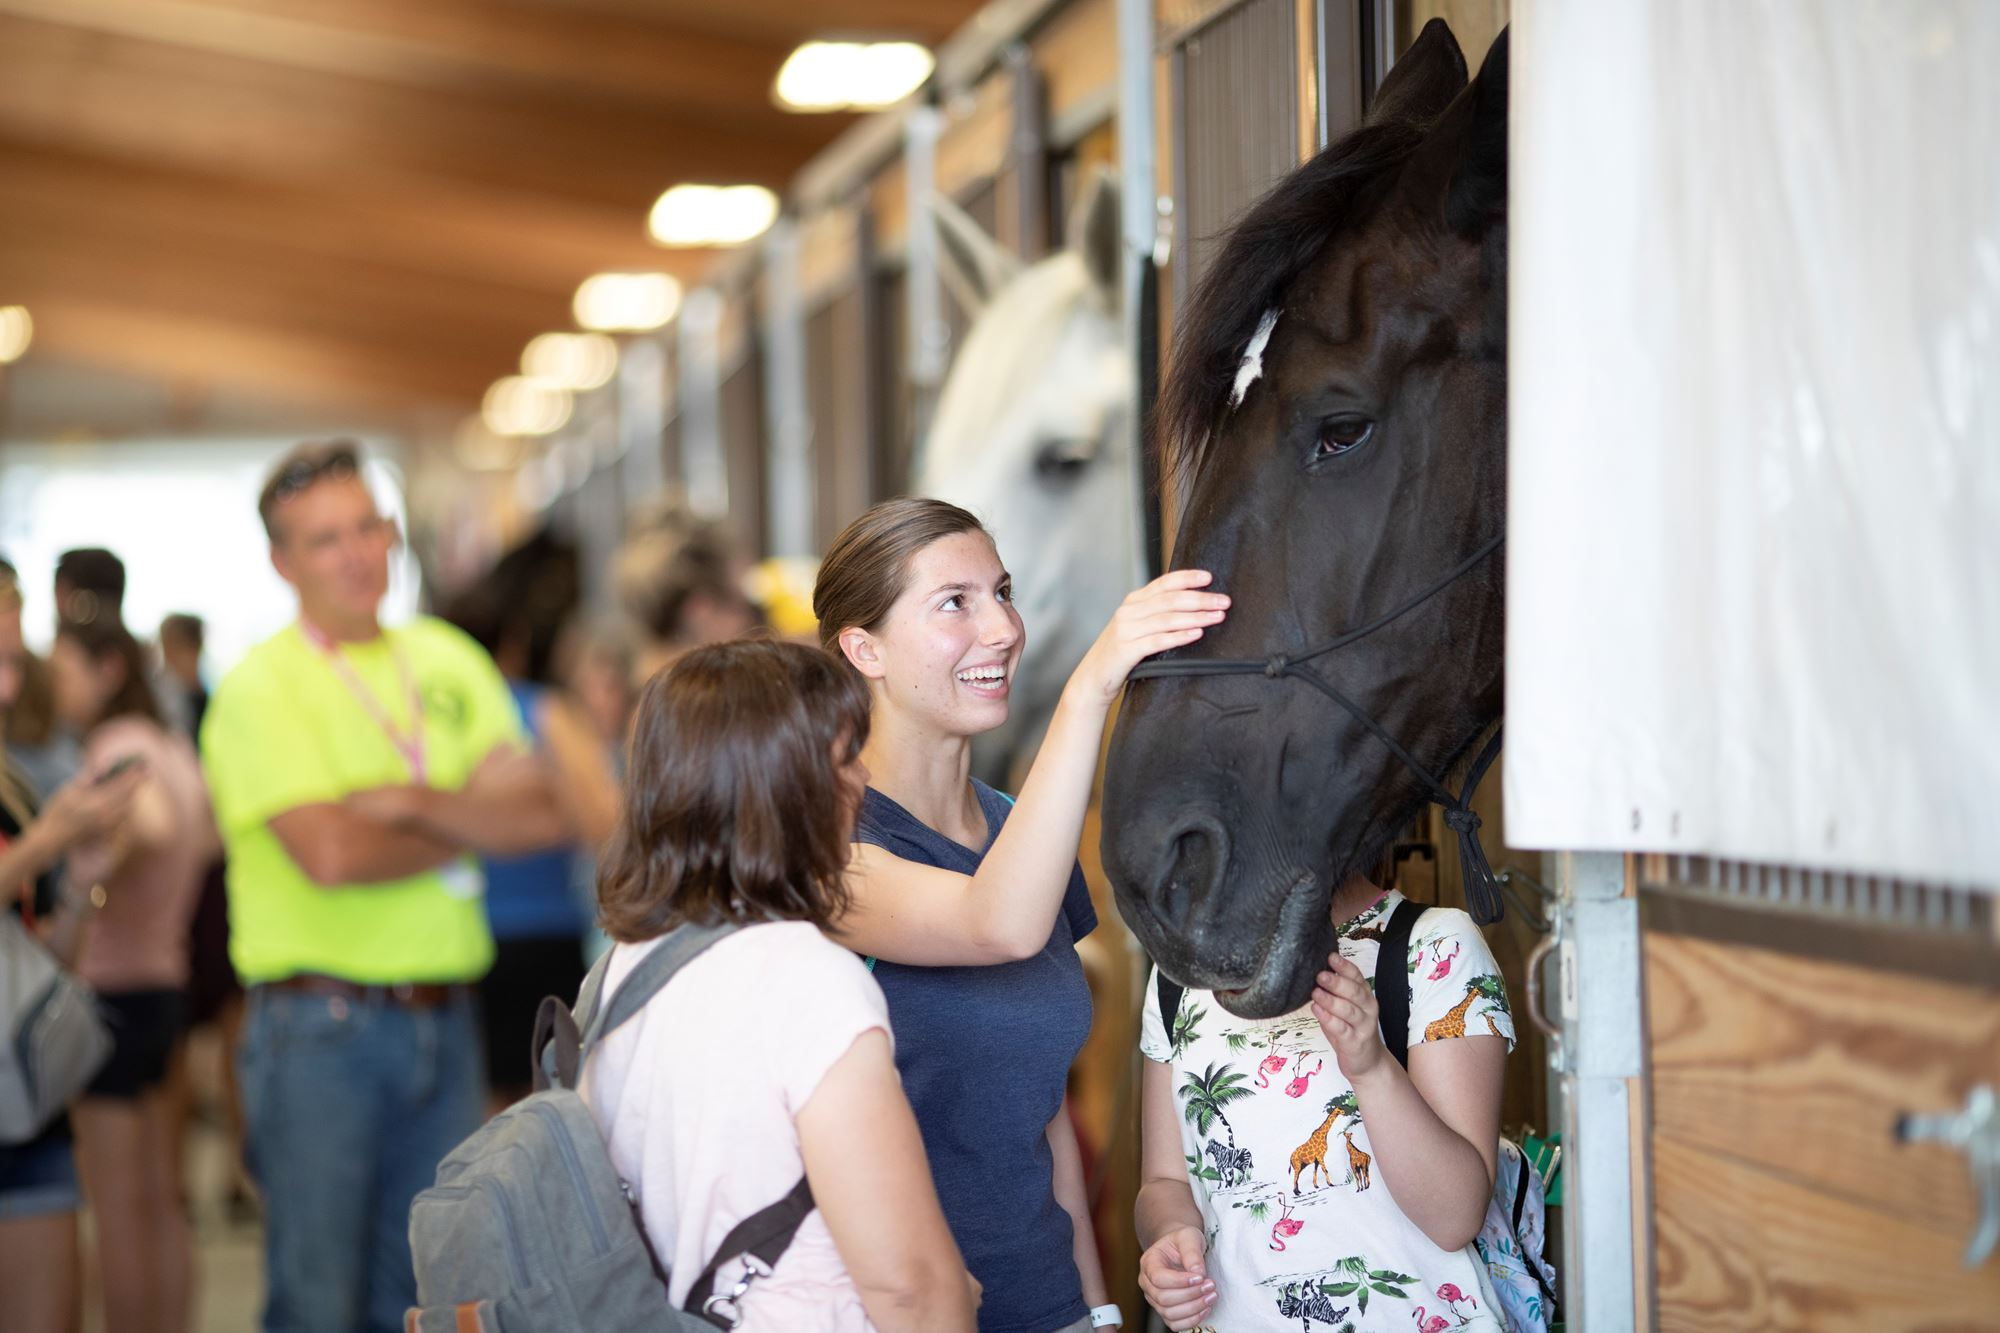 Fairgoers interacting inside Horse Headquarters